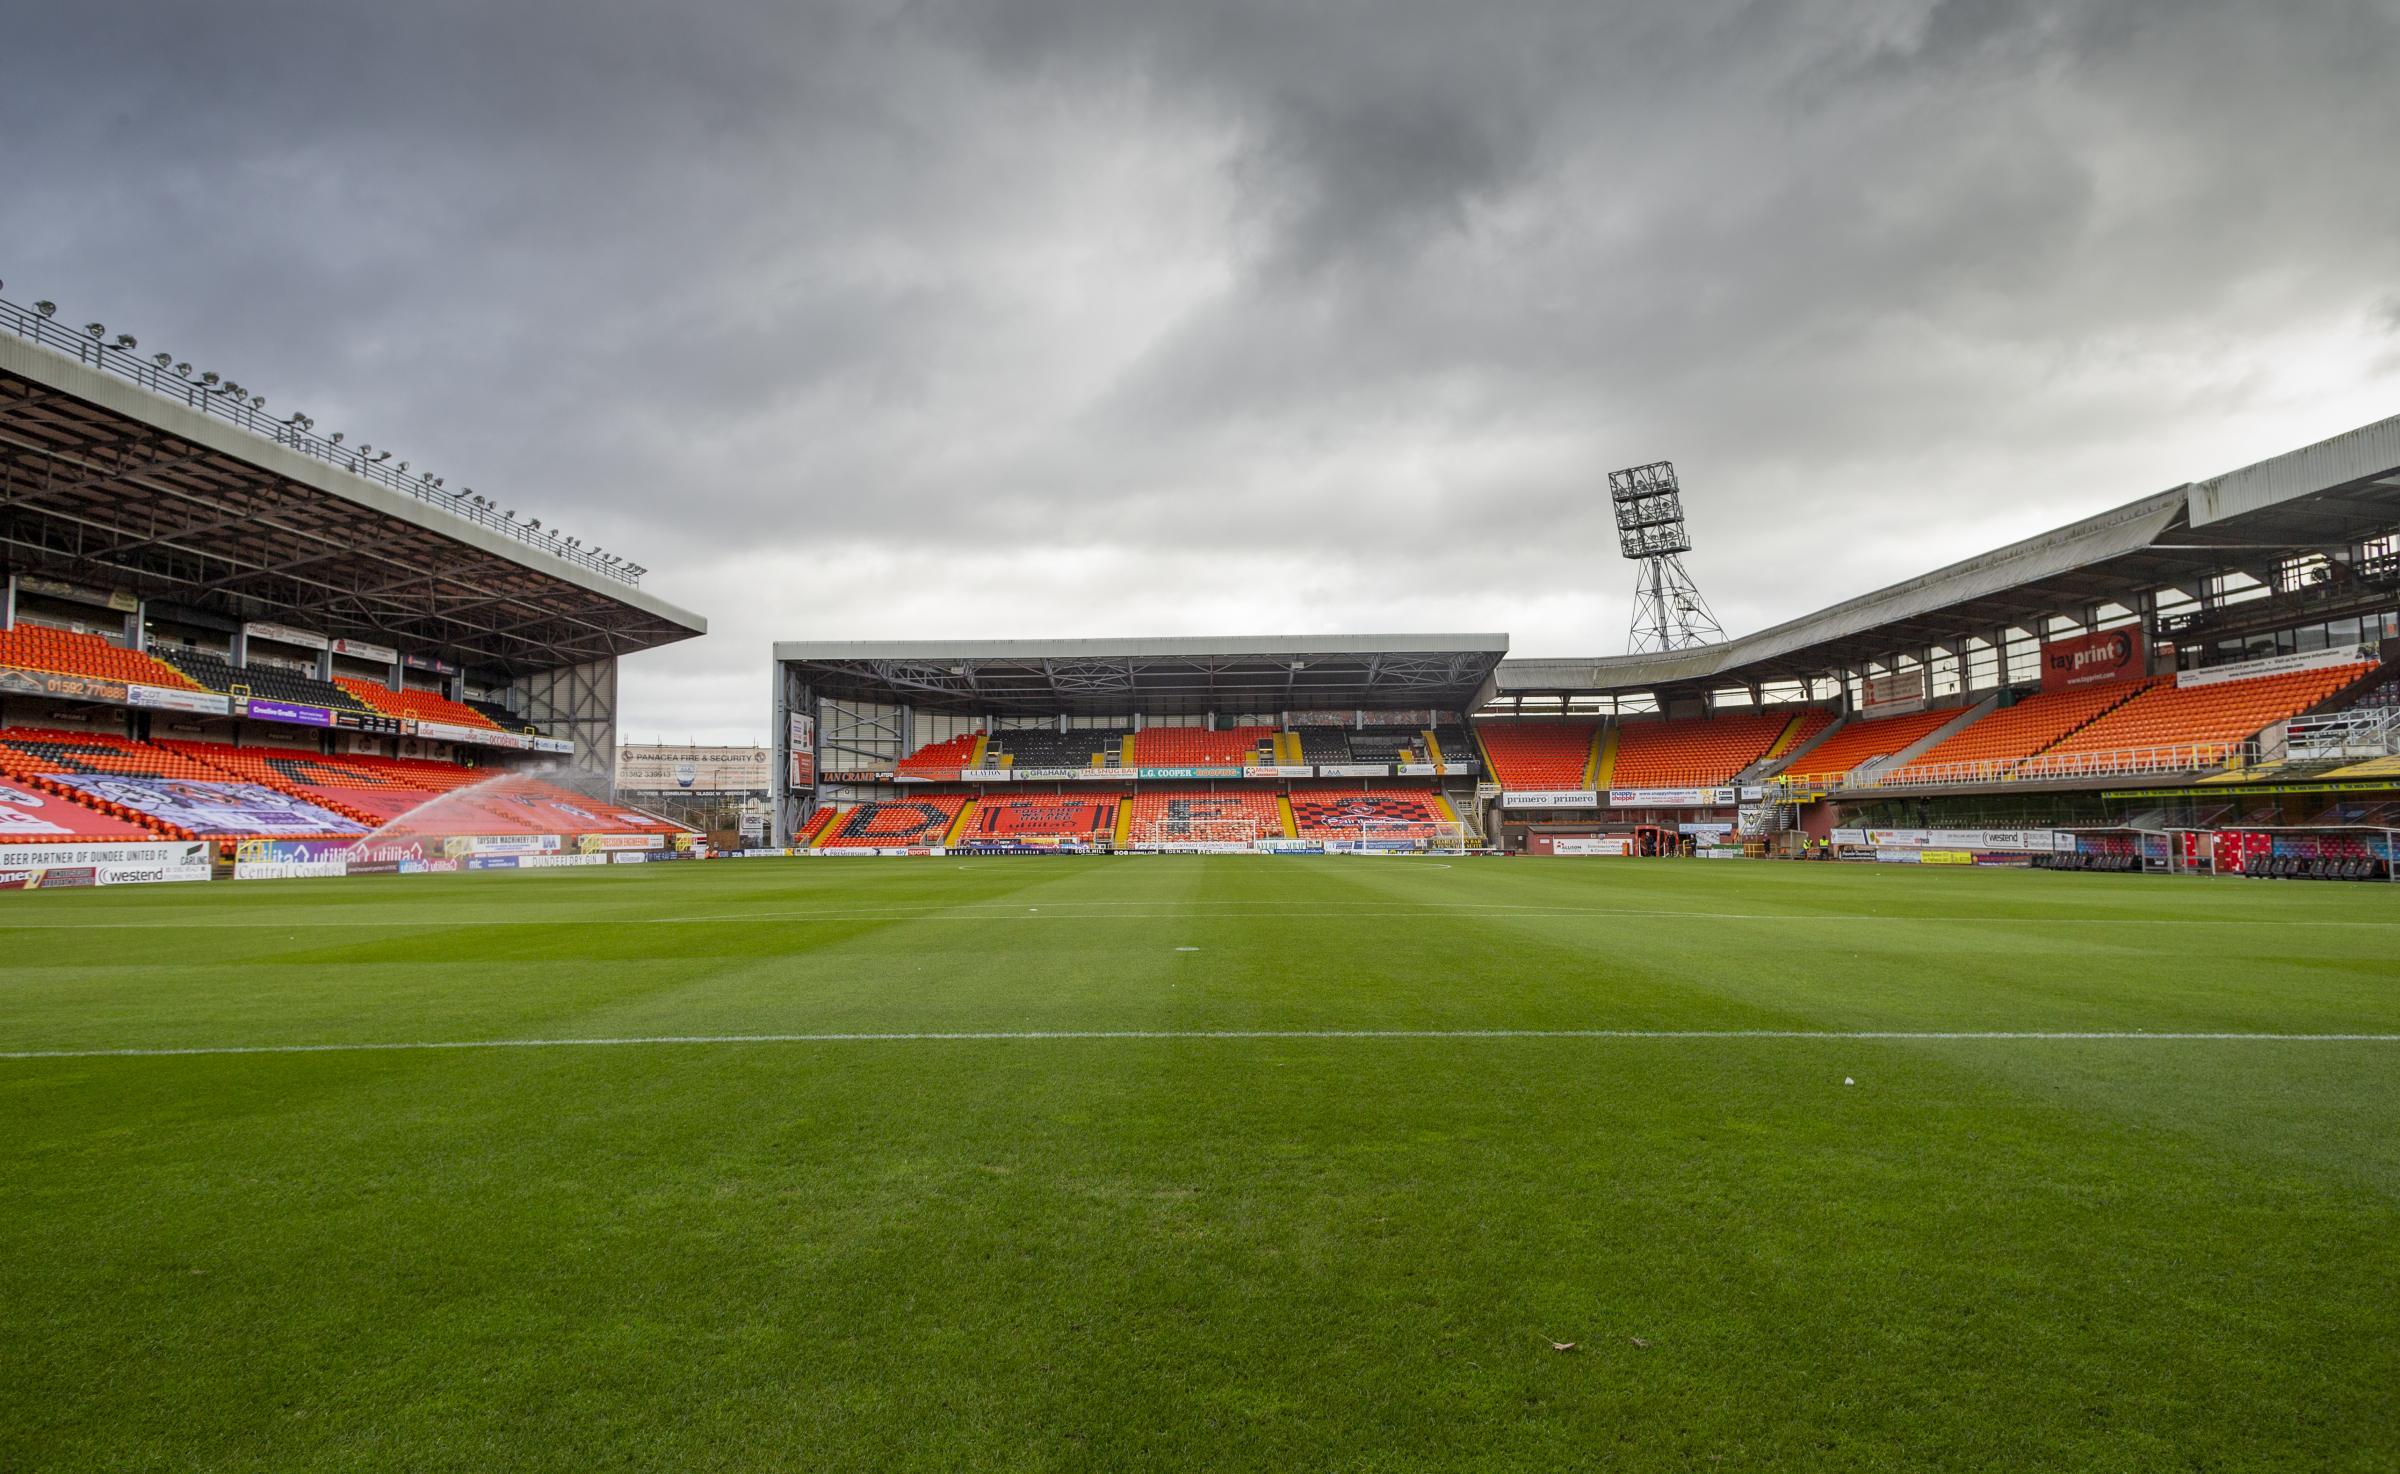 St Johnstone demand SPFL investigation into Dundee United after fixture postponement